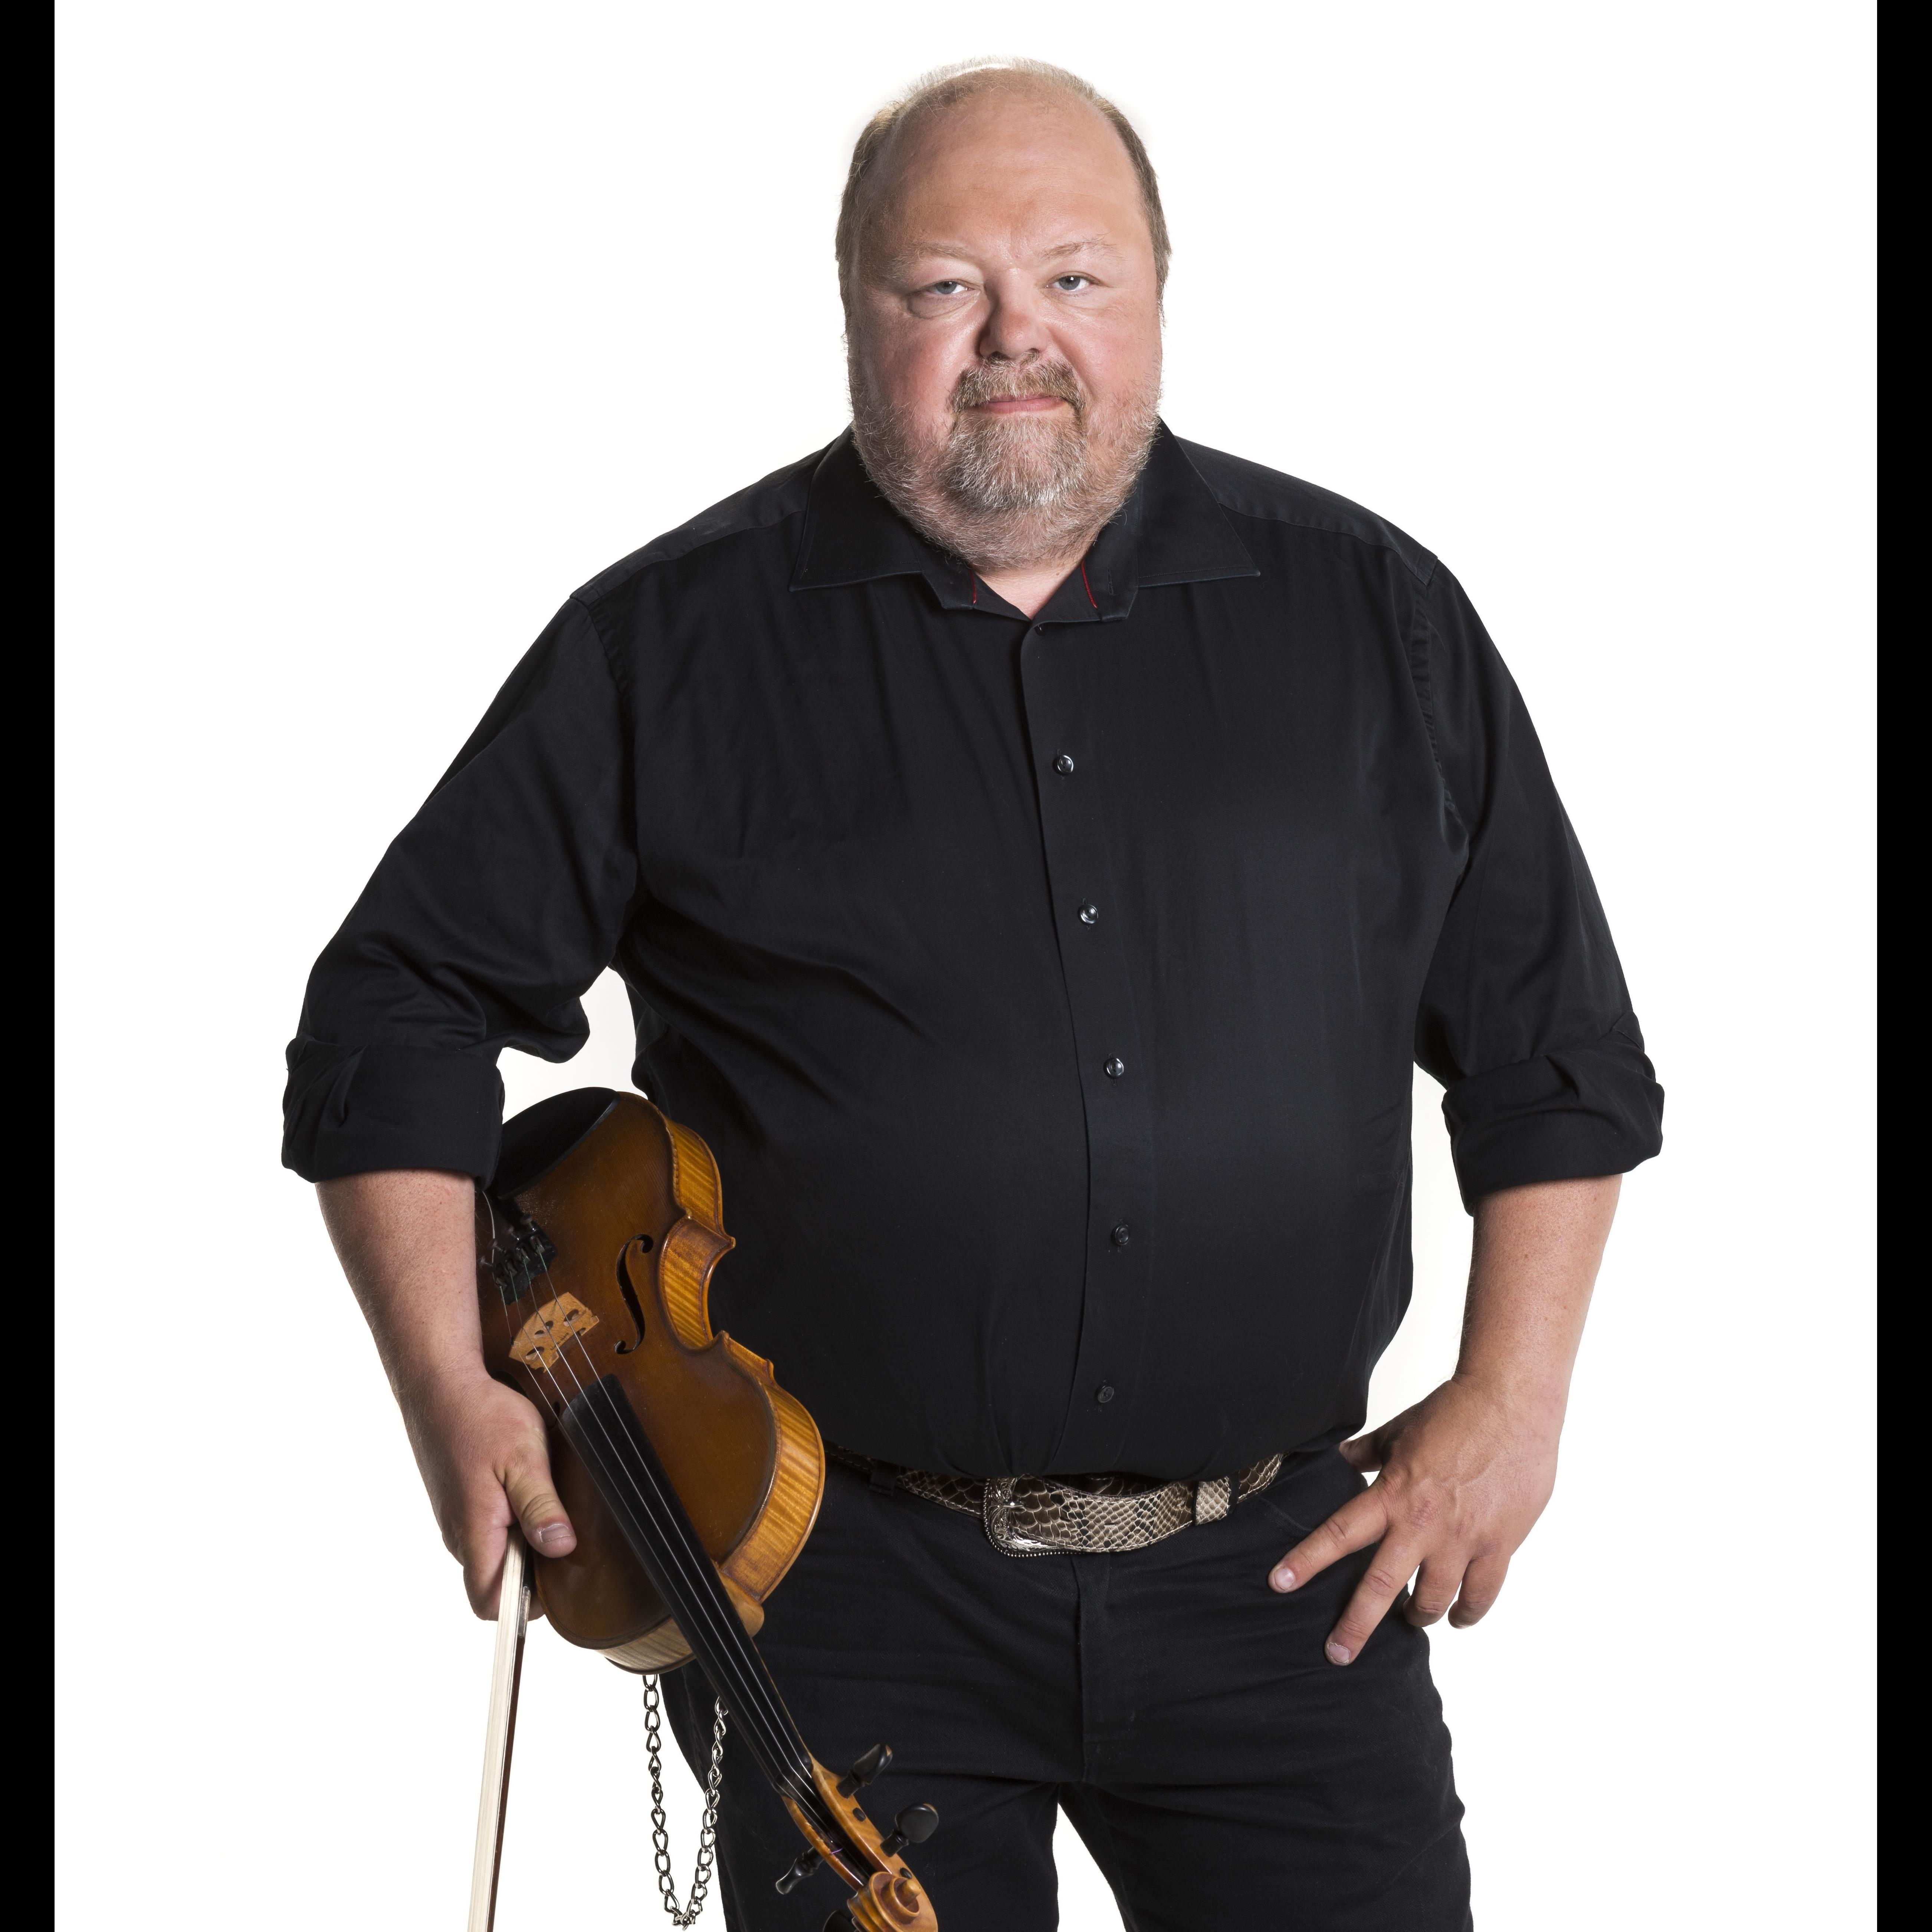 Kalle Moraeus, Hemvärnets Musikkår & BSM